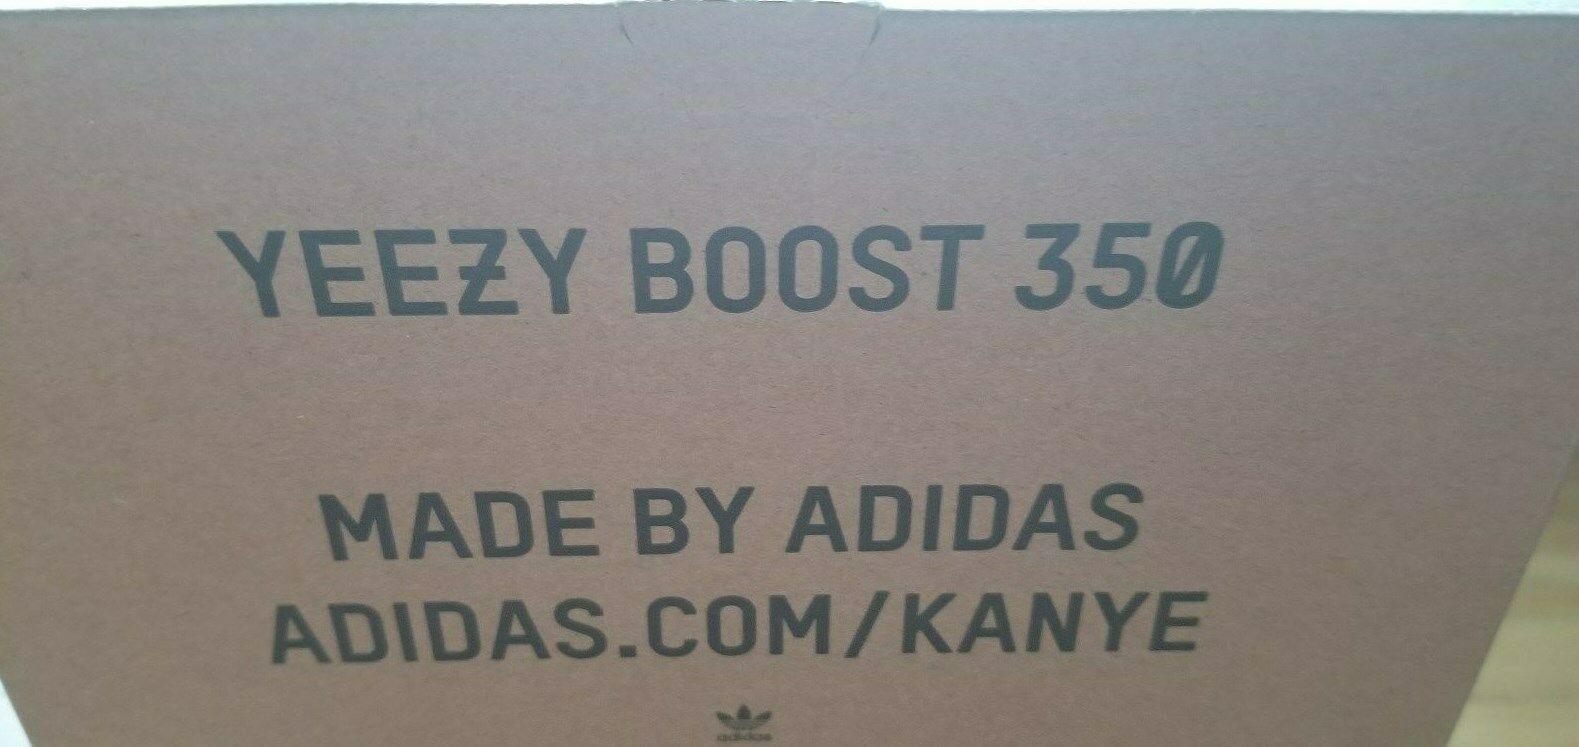 Neuf Adidas Yeezy 350 V2 Blanc Crème CP9366 Tout Neuf dans le Boite image 5